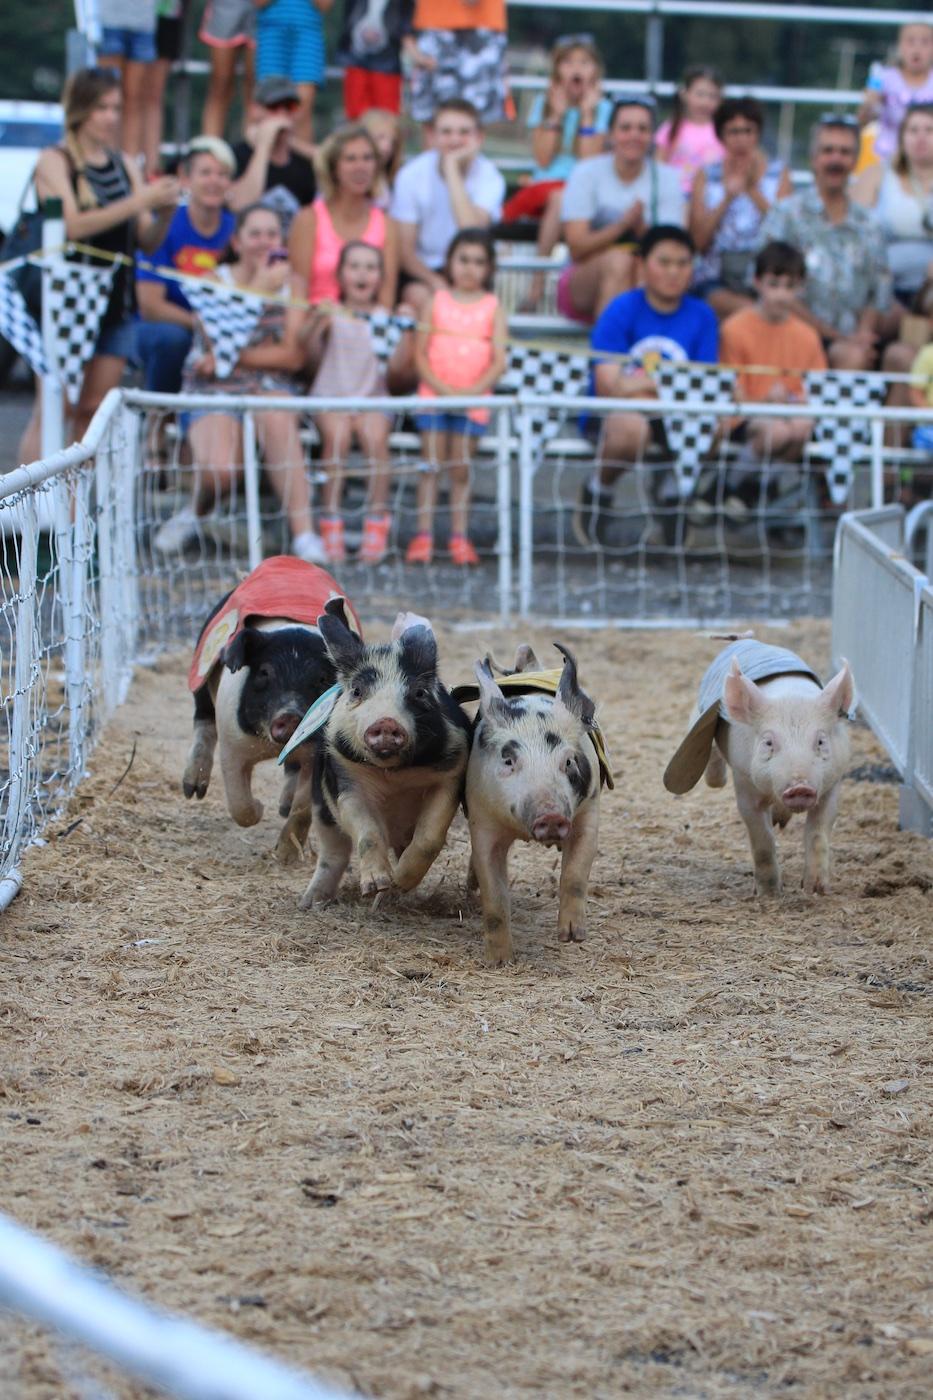 Pig Racing at the County Fair